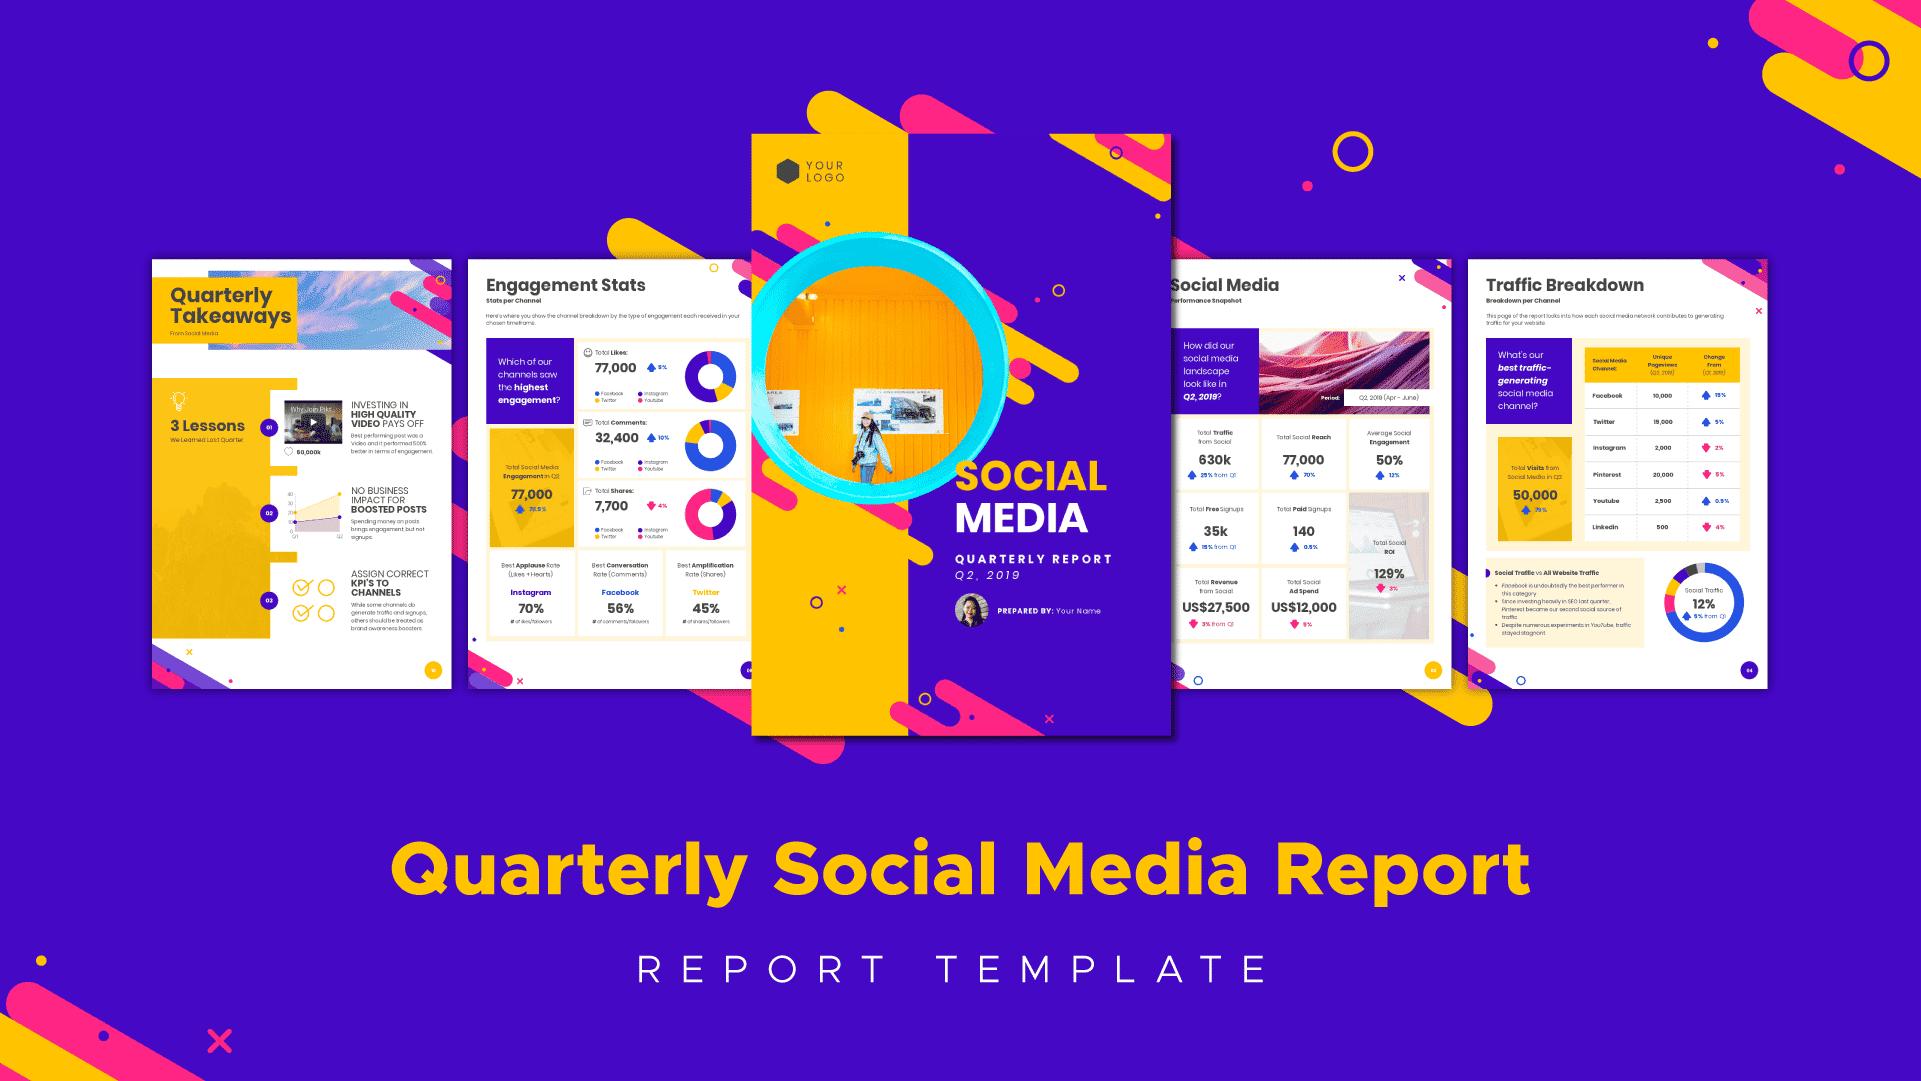 templates-visual_report_1184-9395924